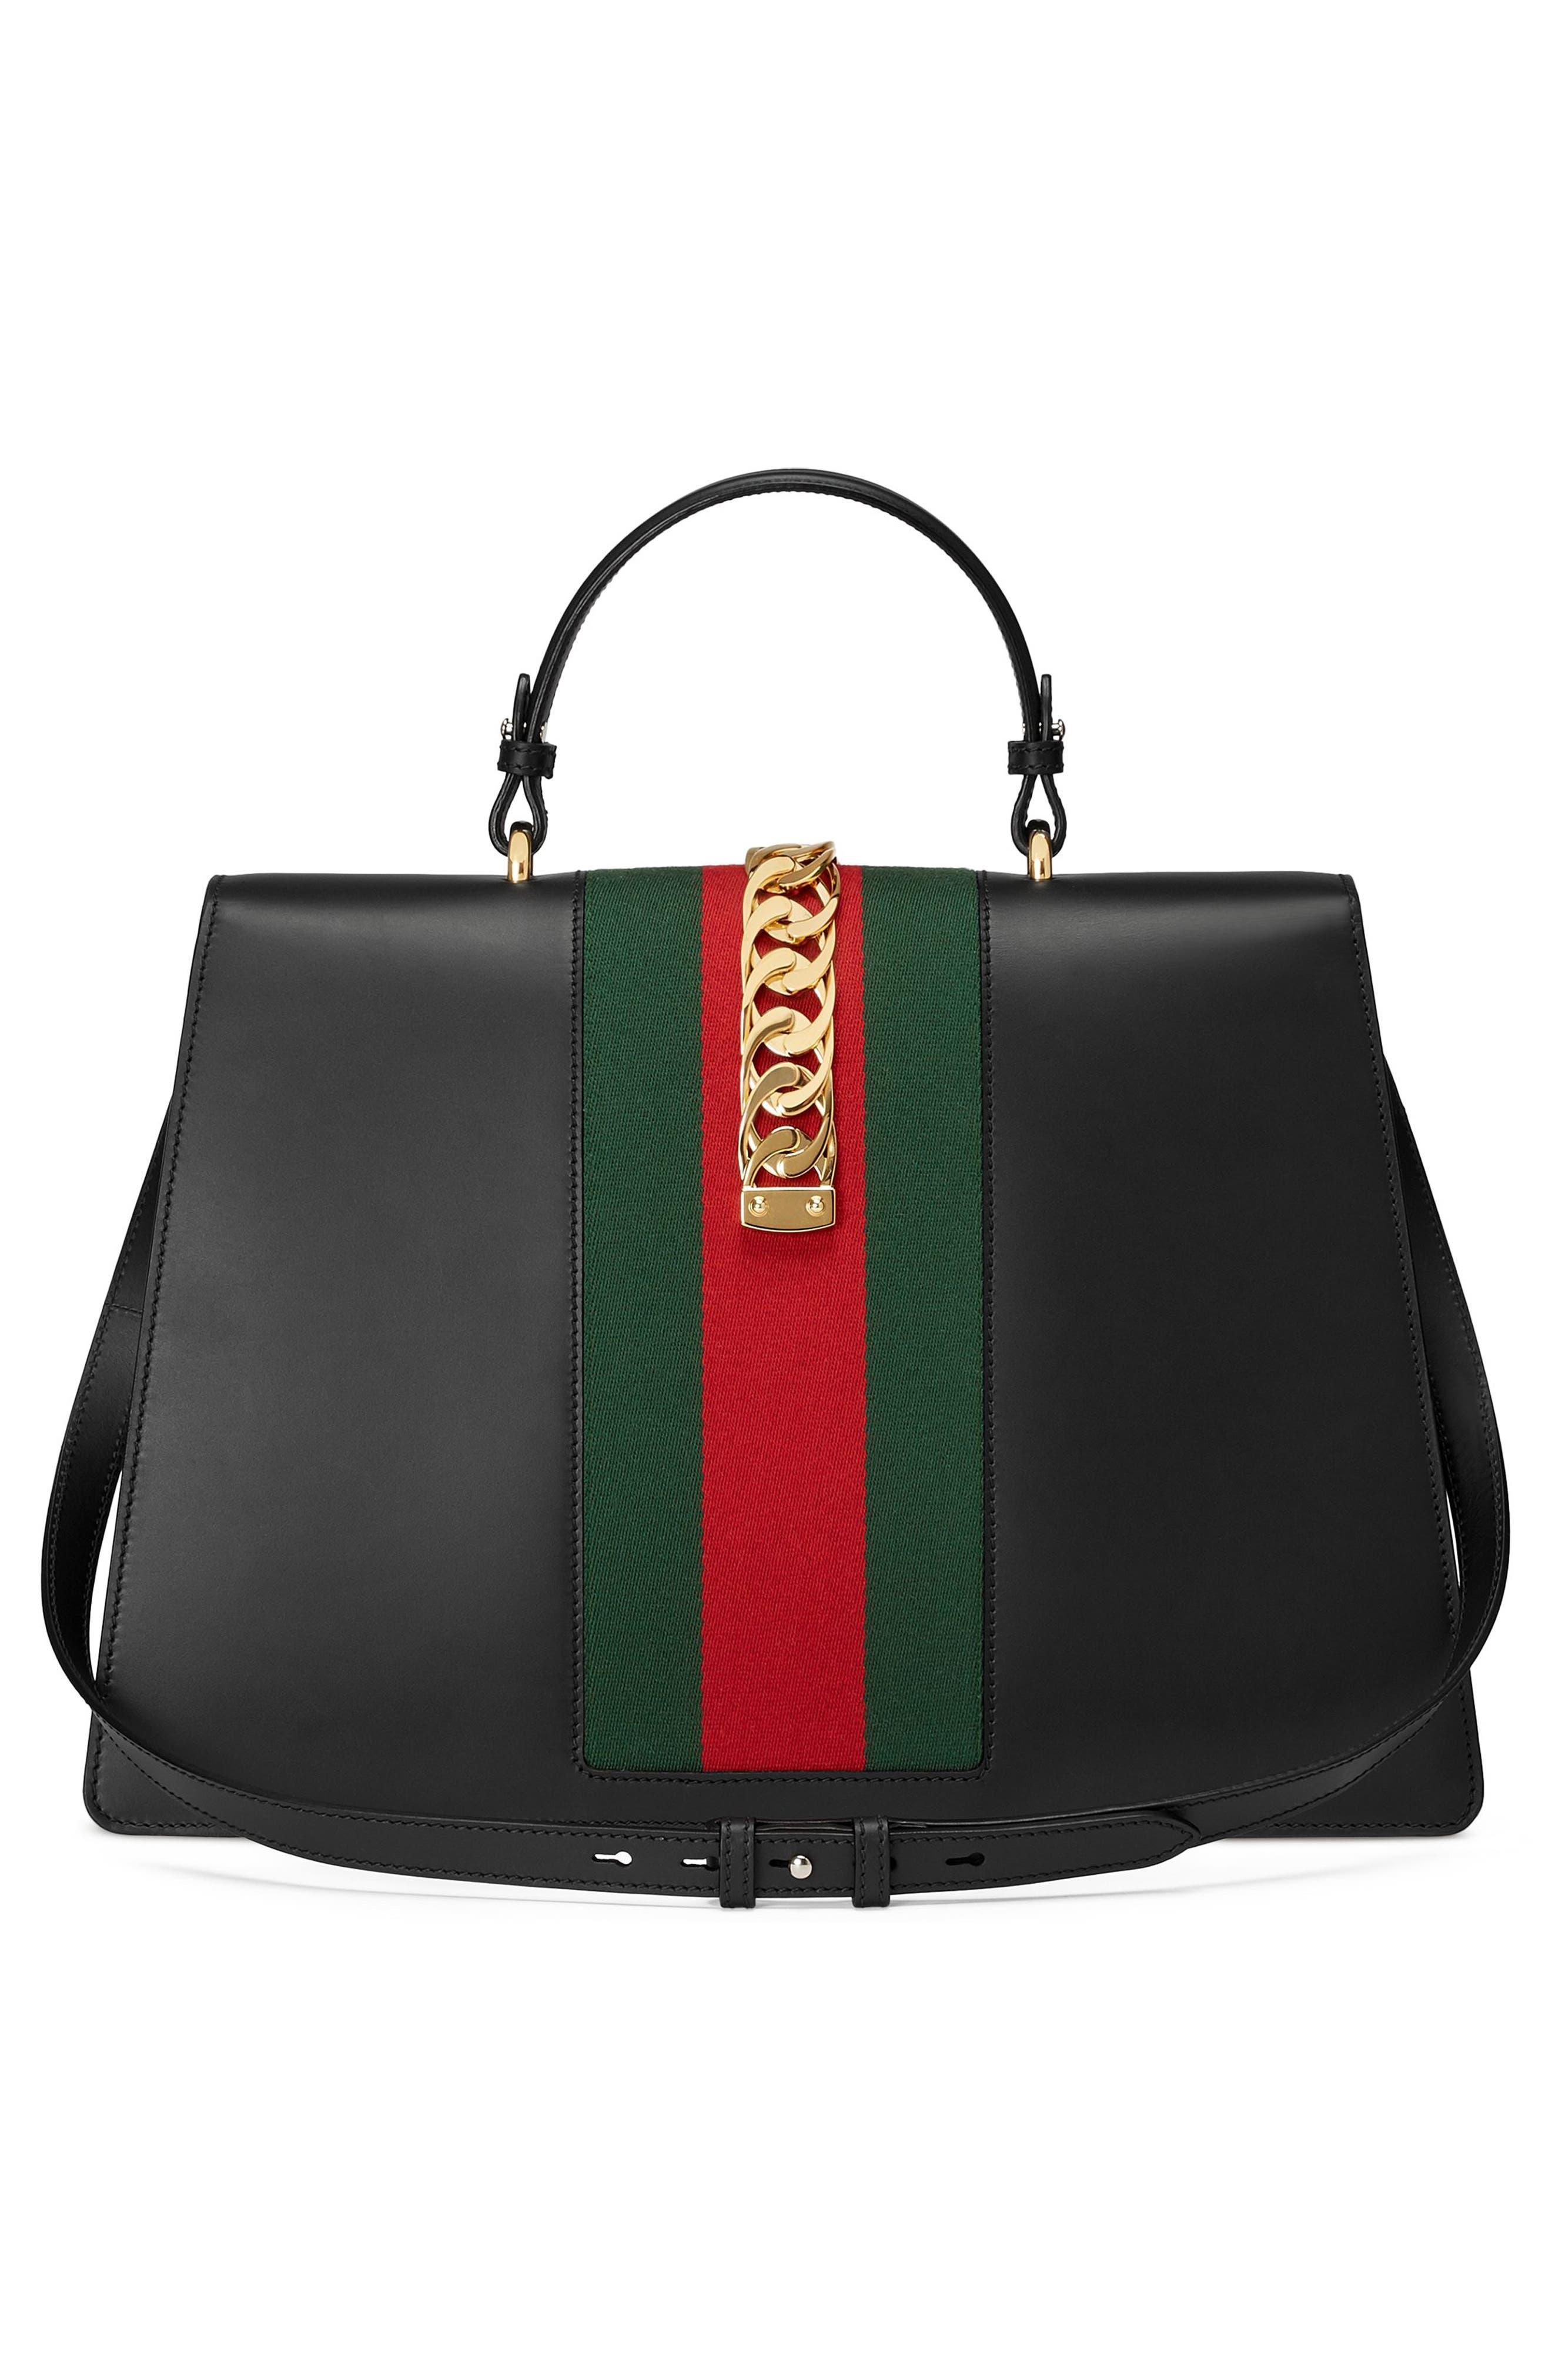 Maxi Sylvie Top Handle Leather Shoulder Bag,                             Alternate thumbnail 3, color,                             NERO/ VERT RED